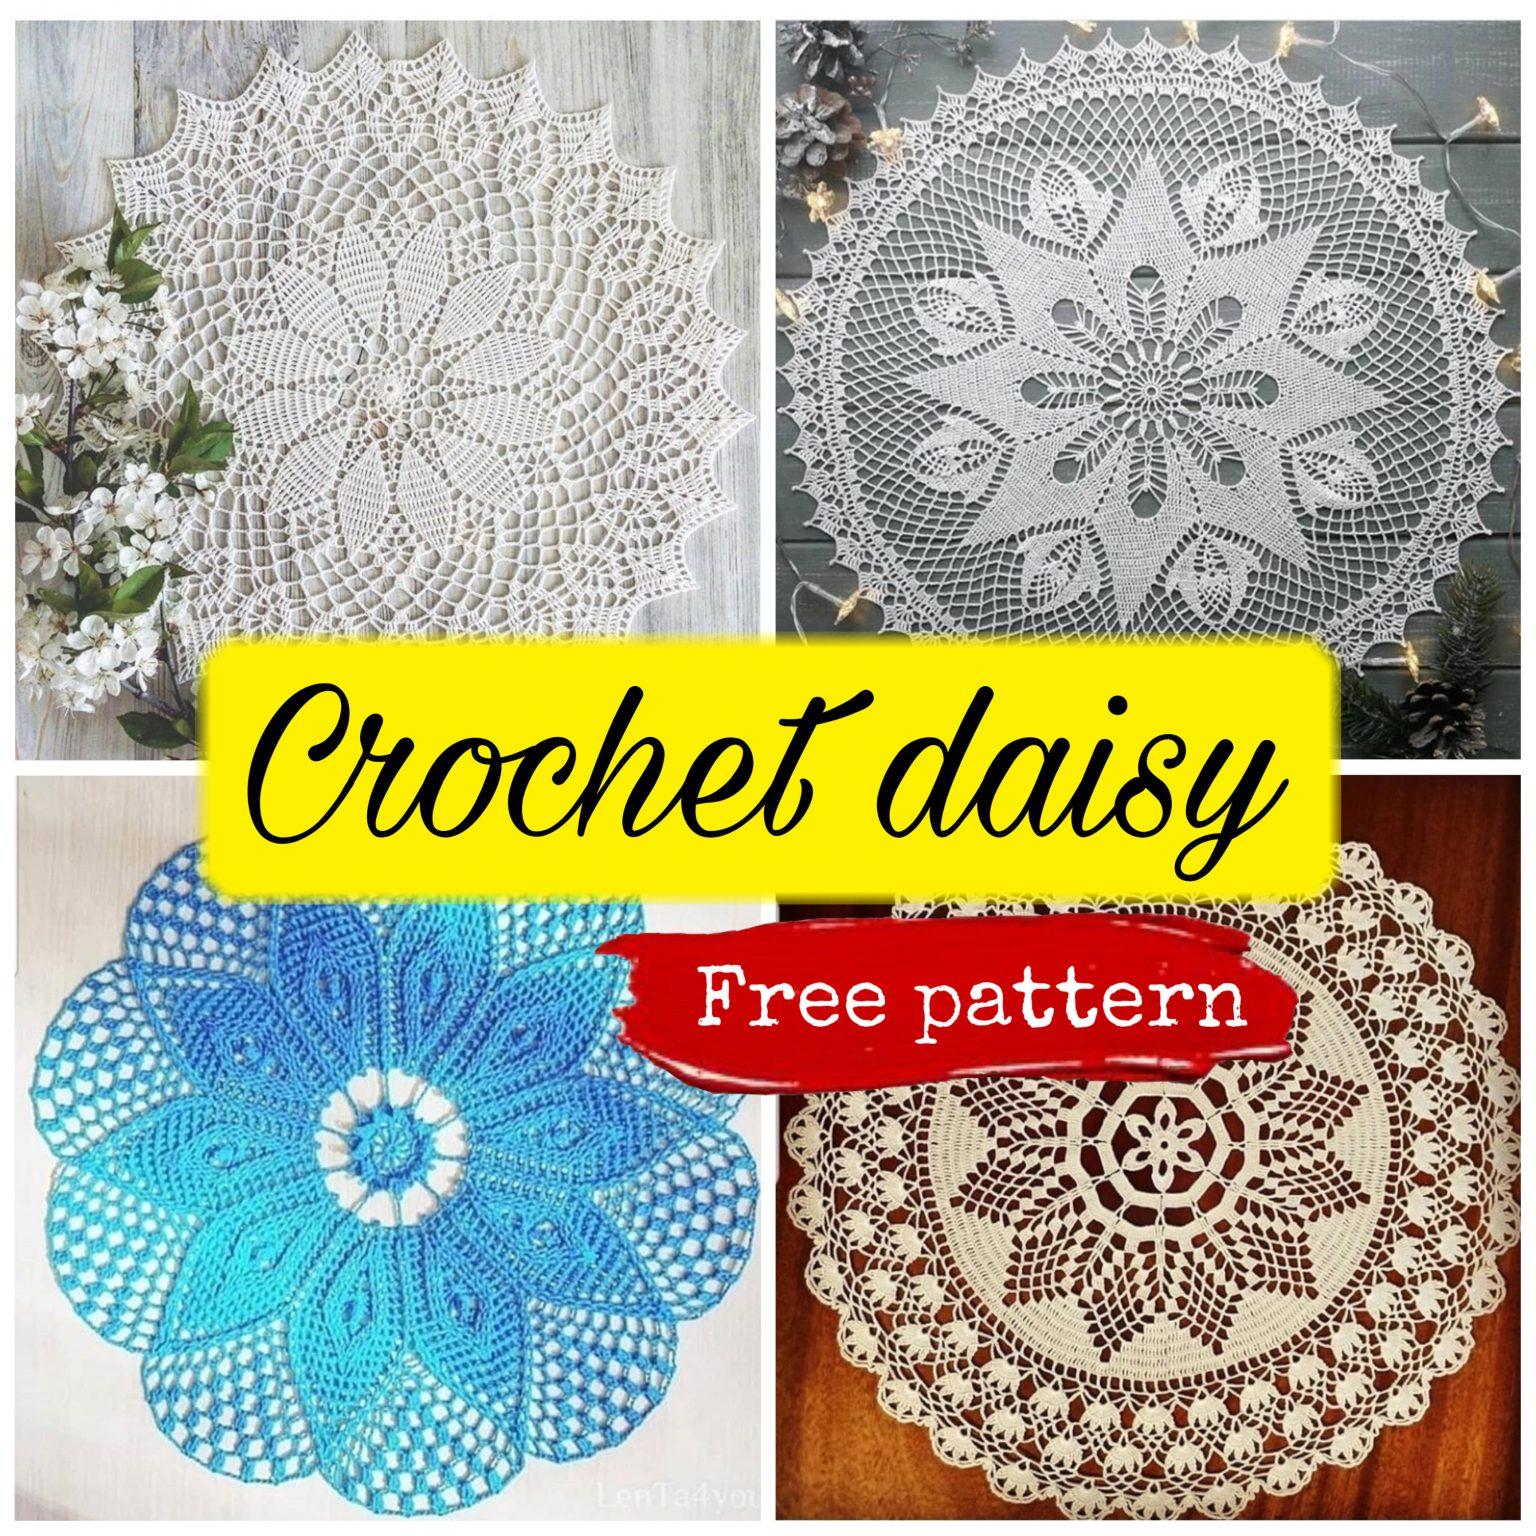 4 Free Crochet Patterns For Daisy Napkins